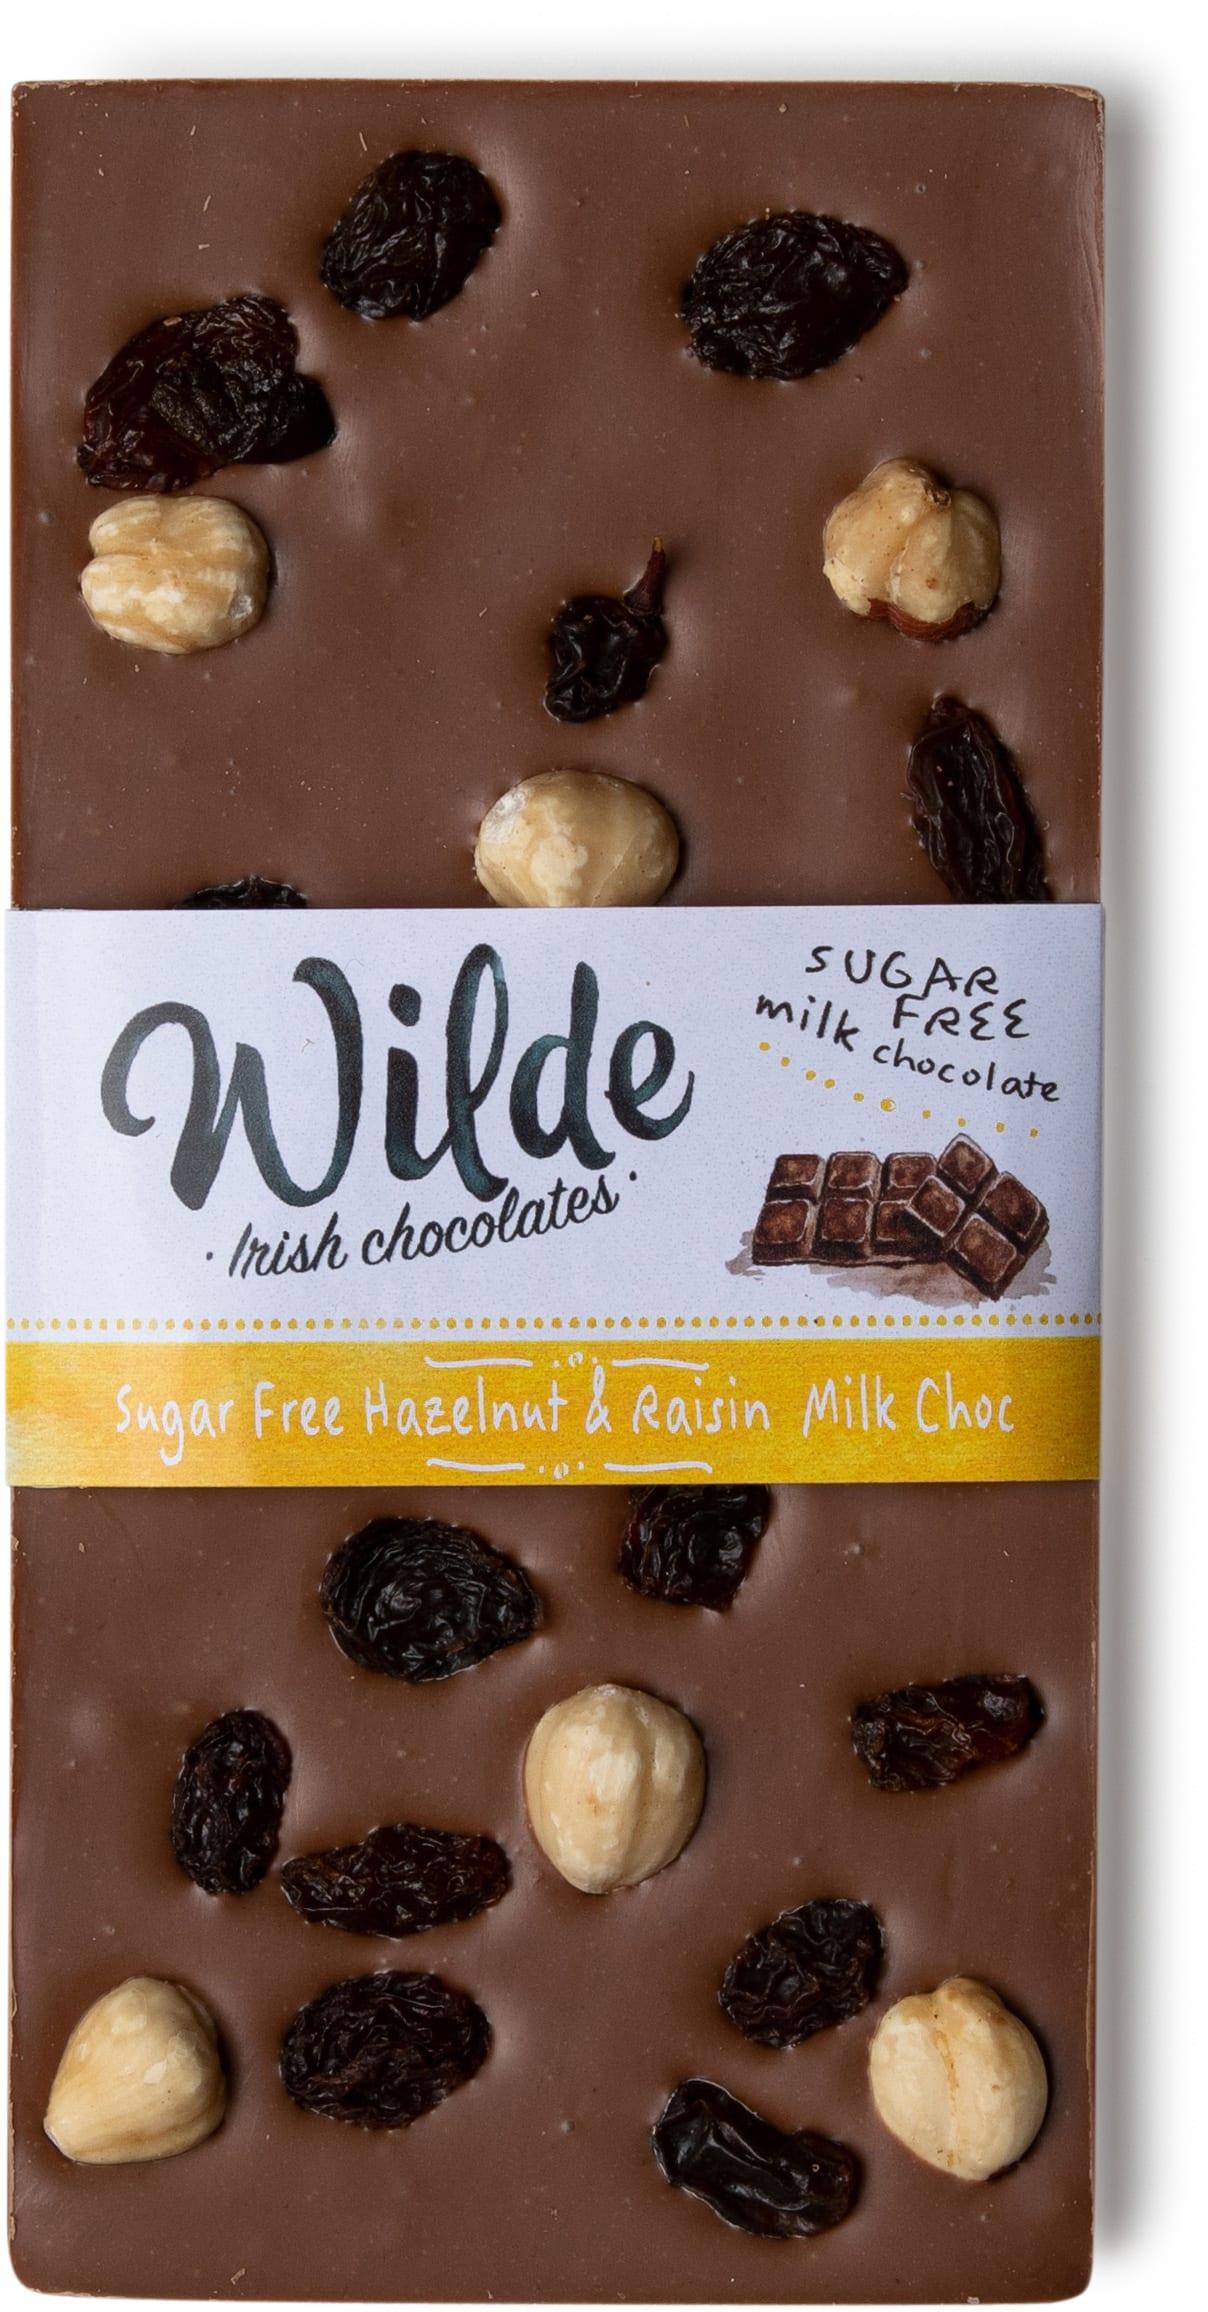 Sugar free Hazelnut & Raisin Milk Chocolate bar - Wilde Irish Chocolates